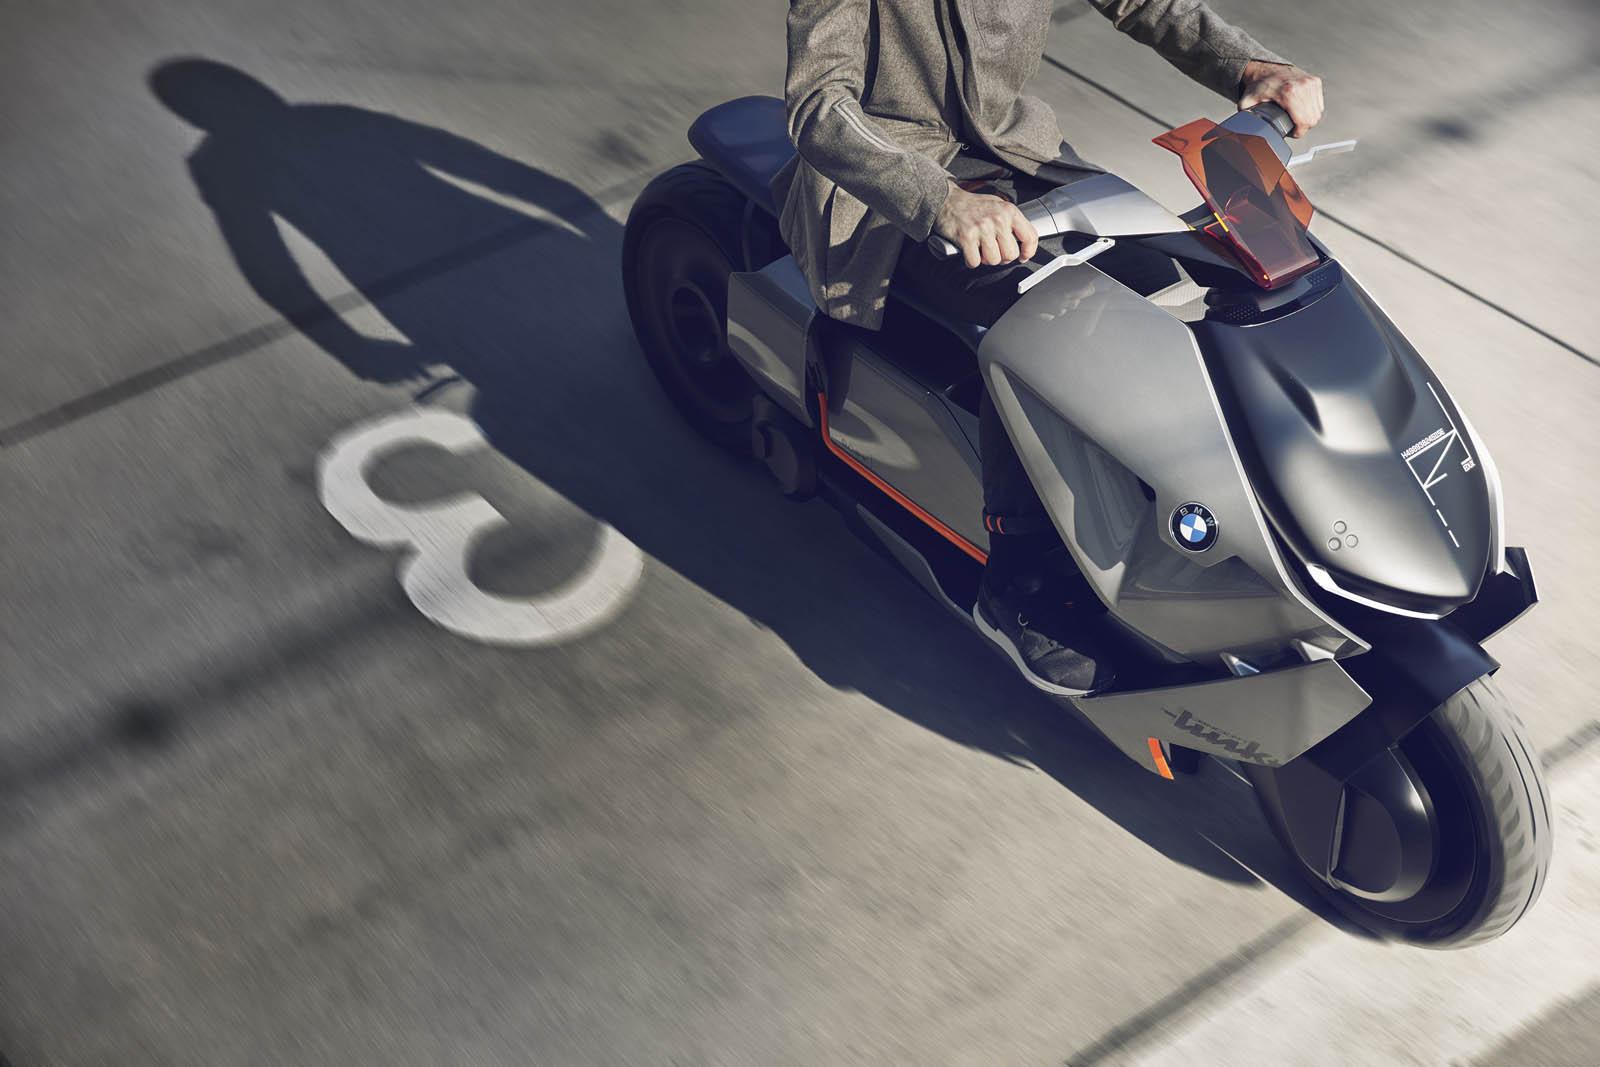 BMW-Motorrad-Concept-Link-P90260580-highRes.jpg